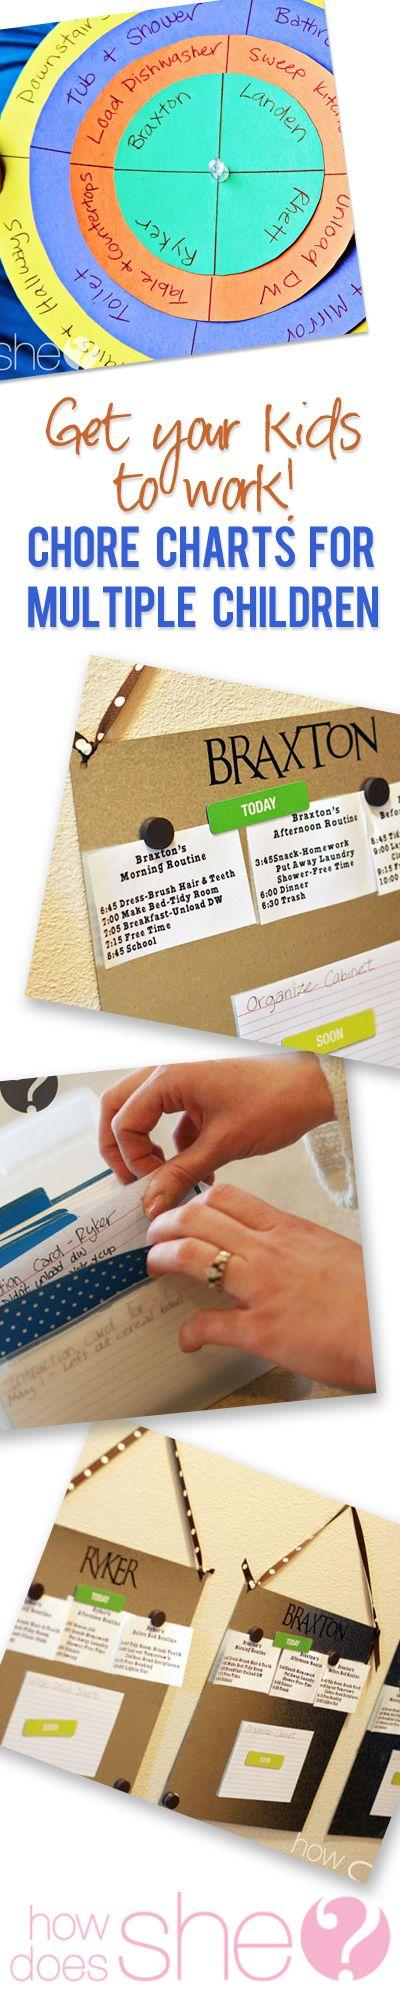 chore charts for multiple children